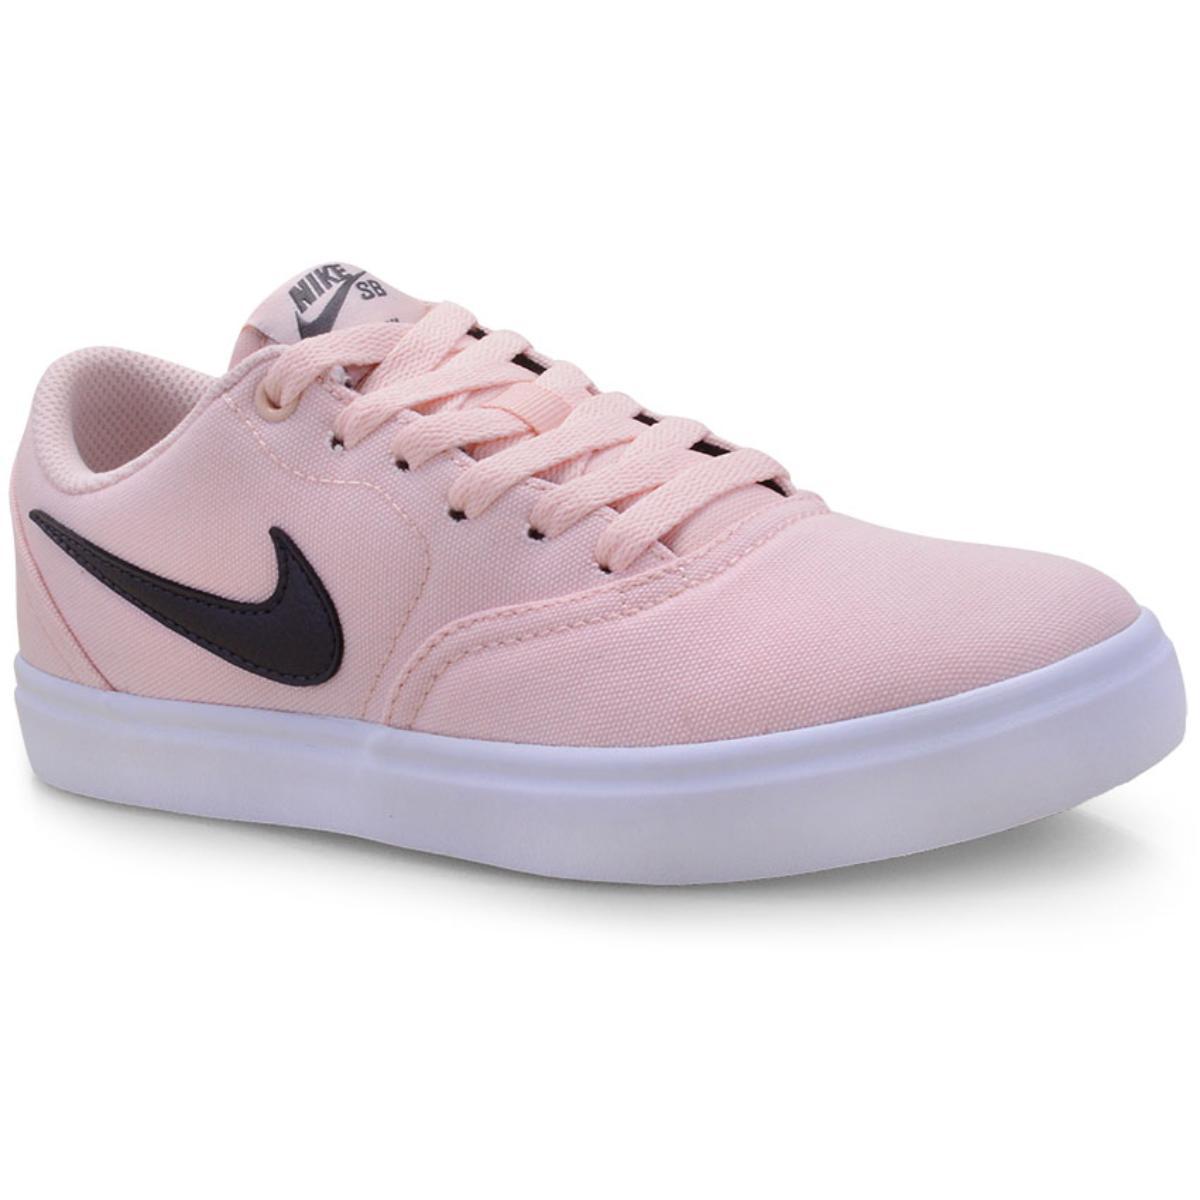 Tênis Feminino Nike 921463-602 sb Check Solar Soft Canvas Pêssego/branco/grafite